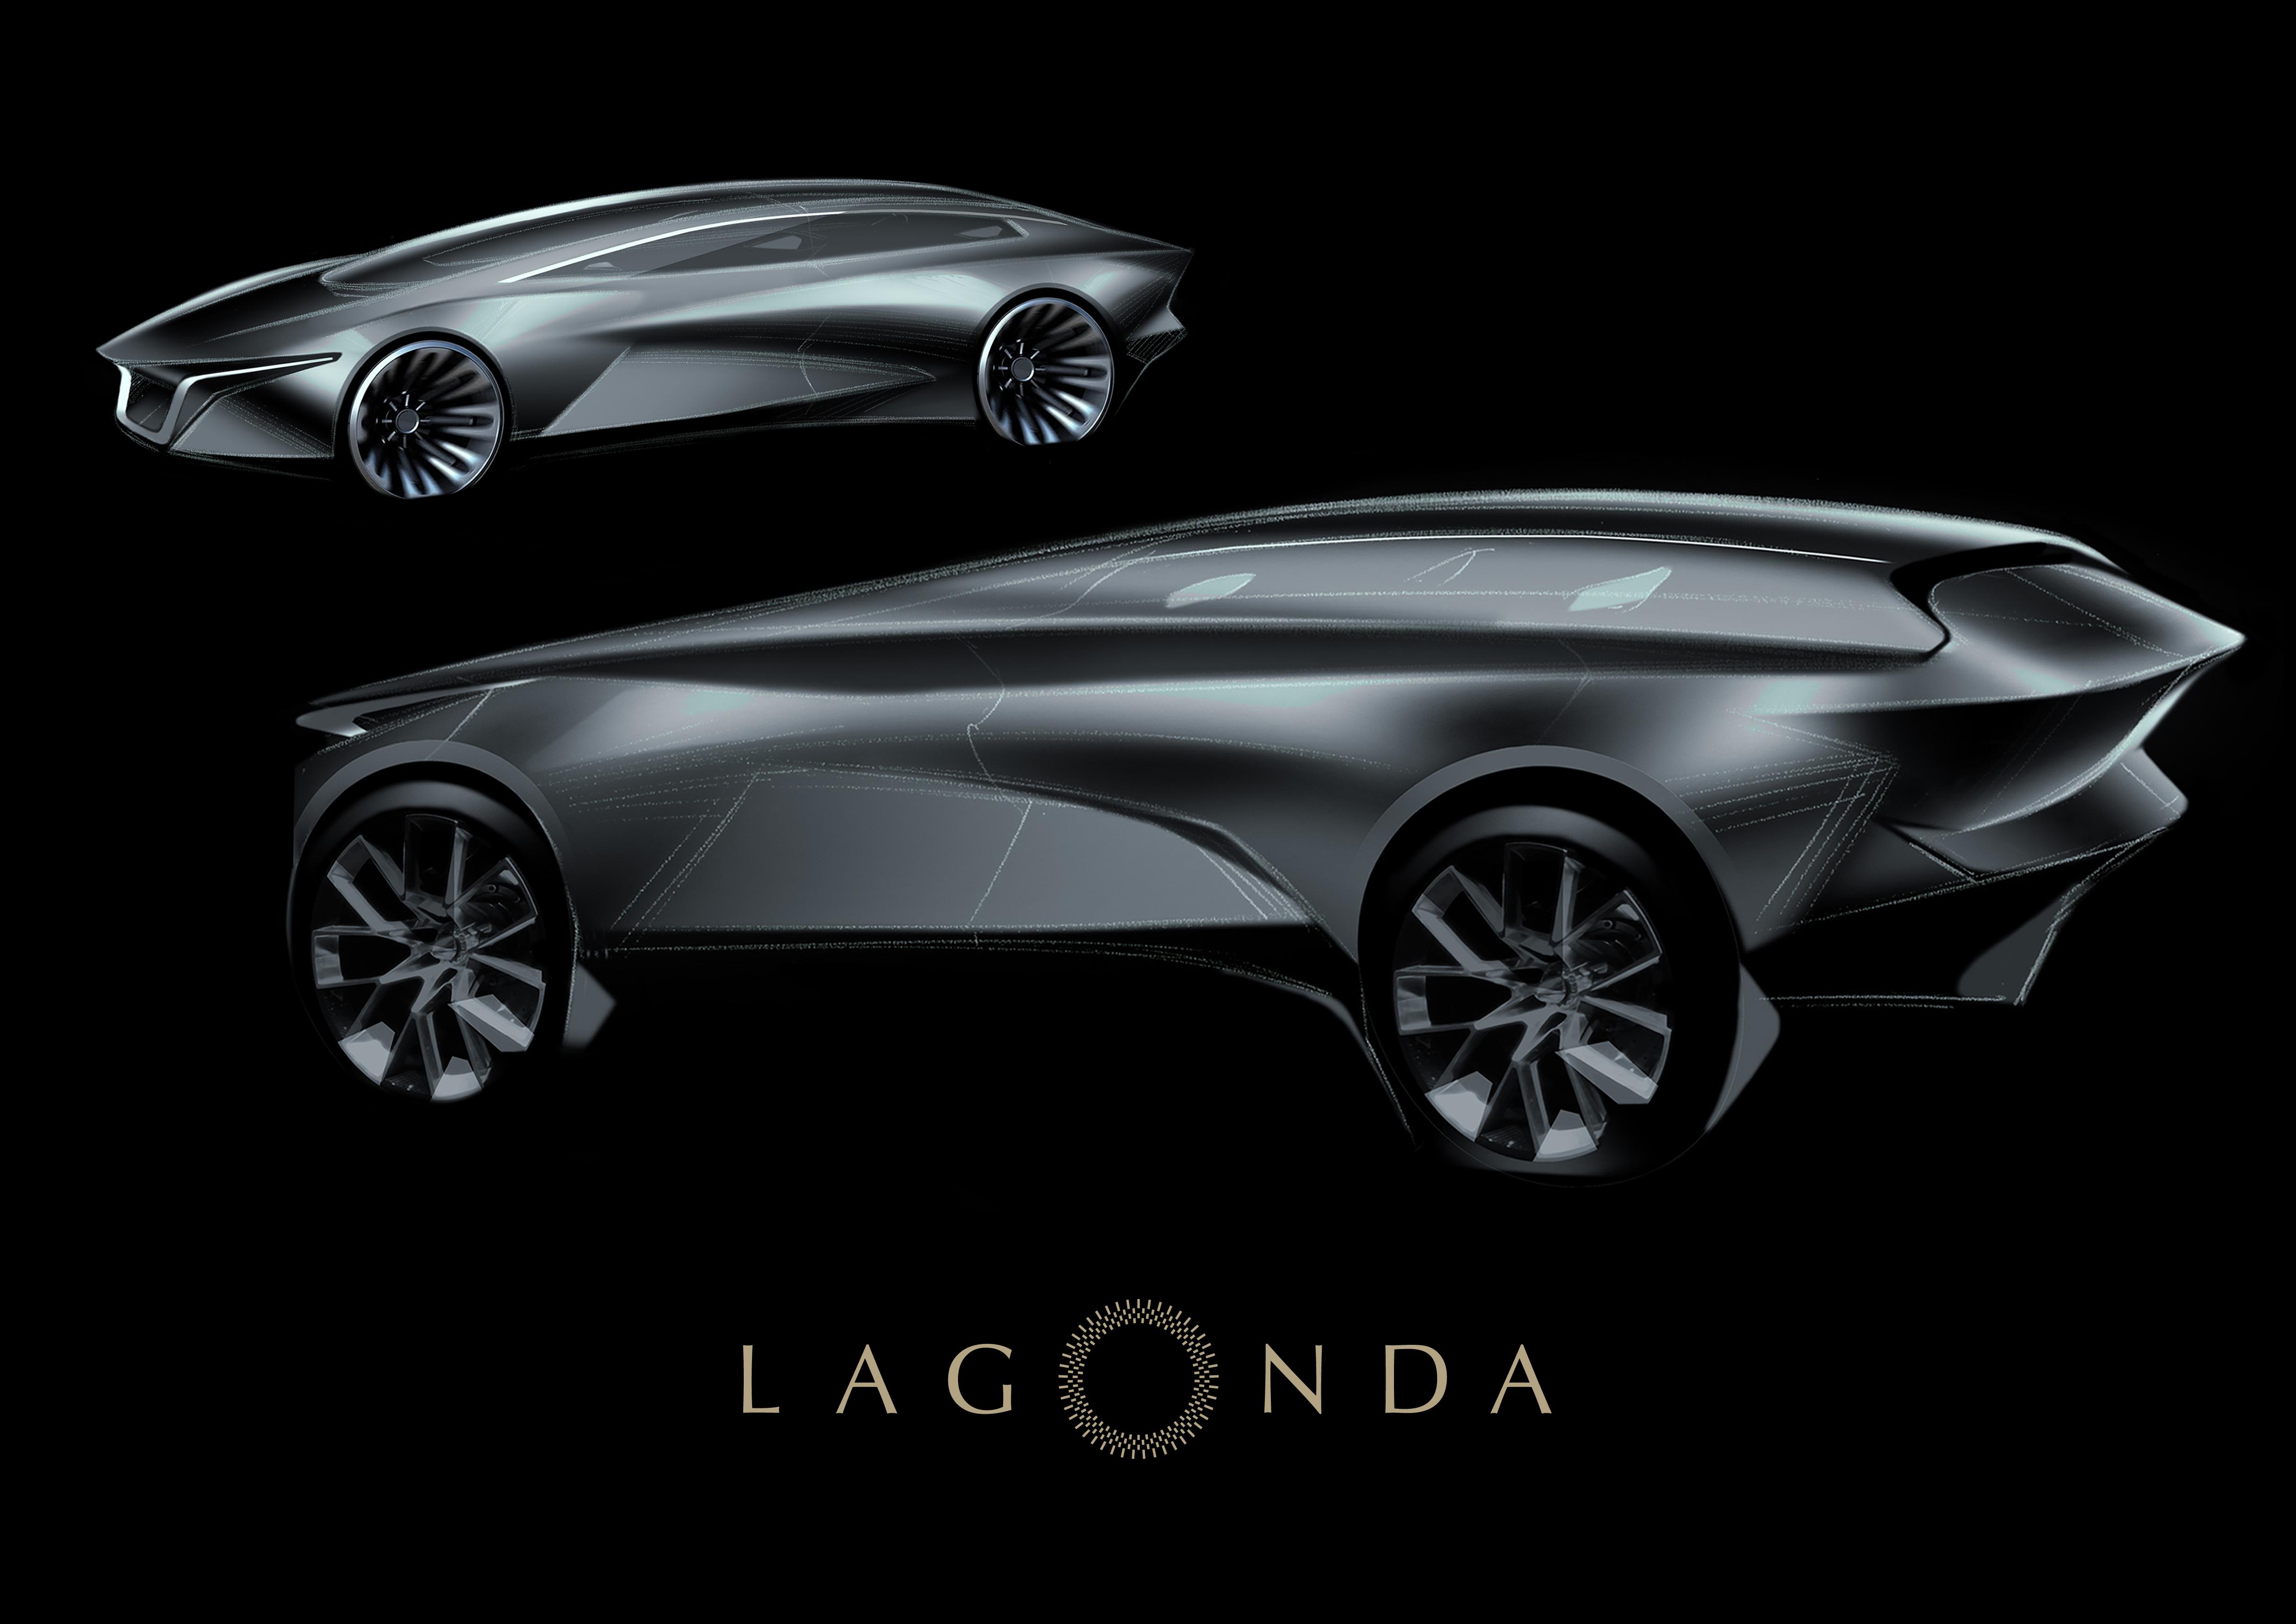 Lagonda all-terrain concept bows at Geneva